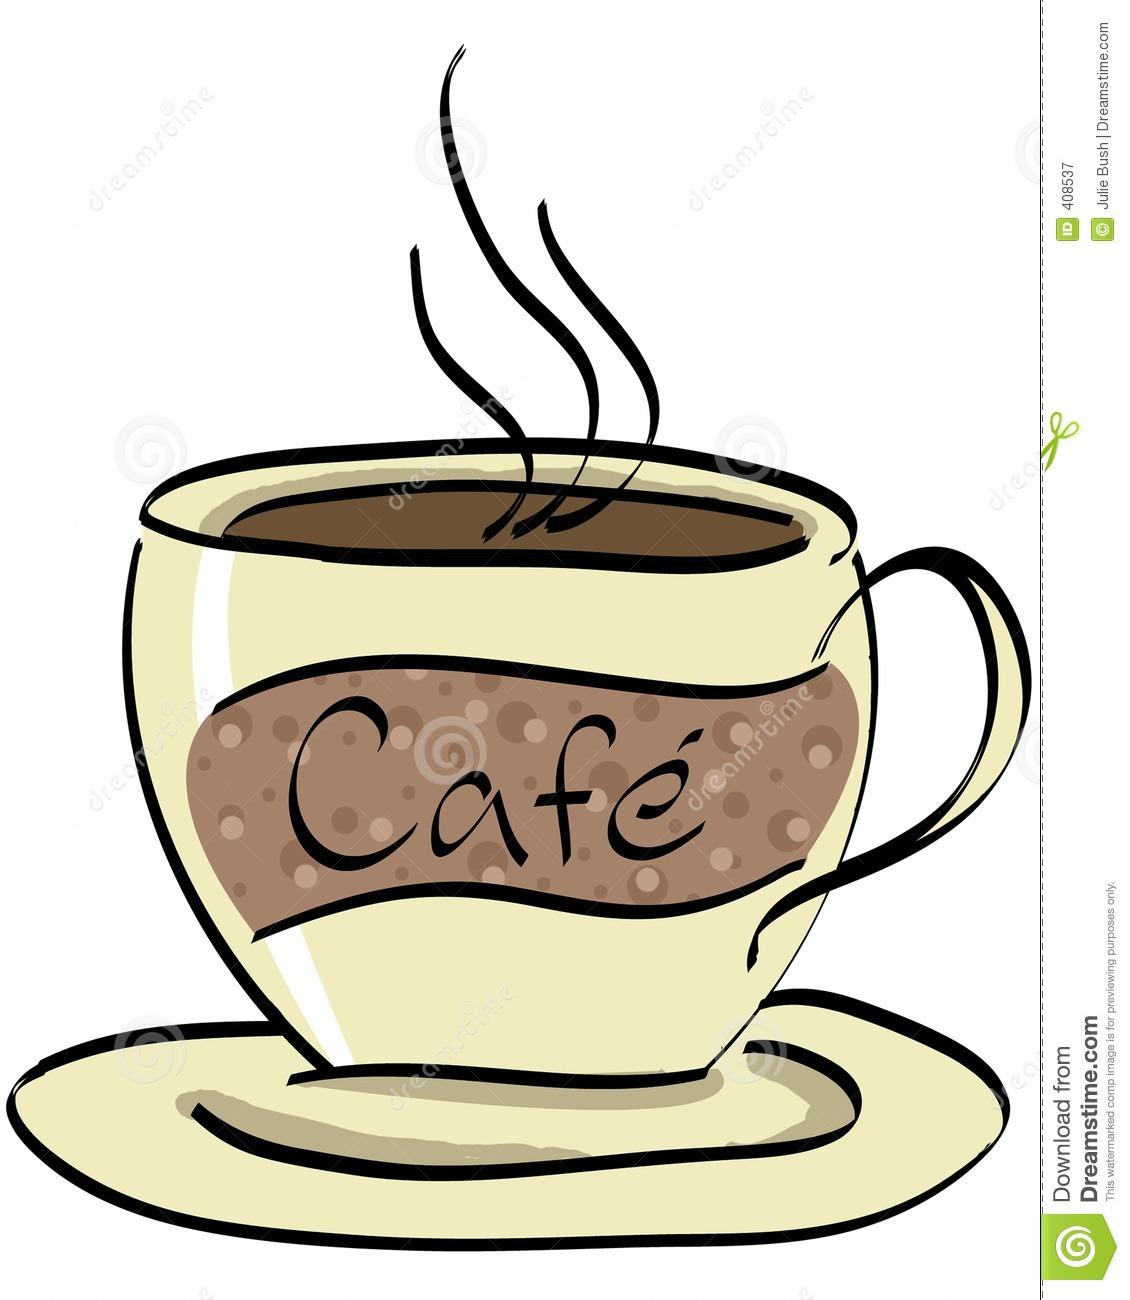 Cafe Clipart & Cafe Clip Art Images.